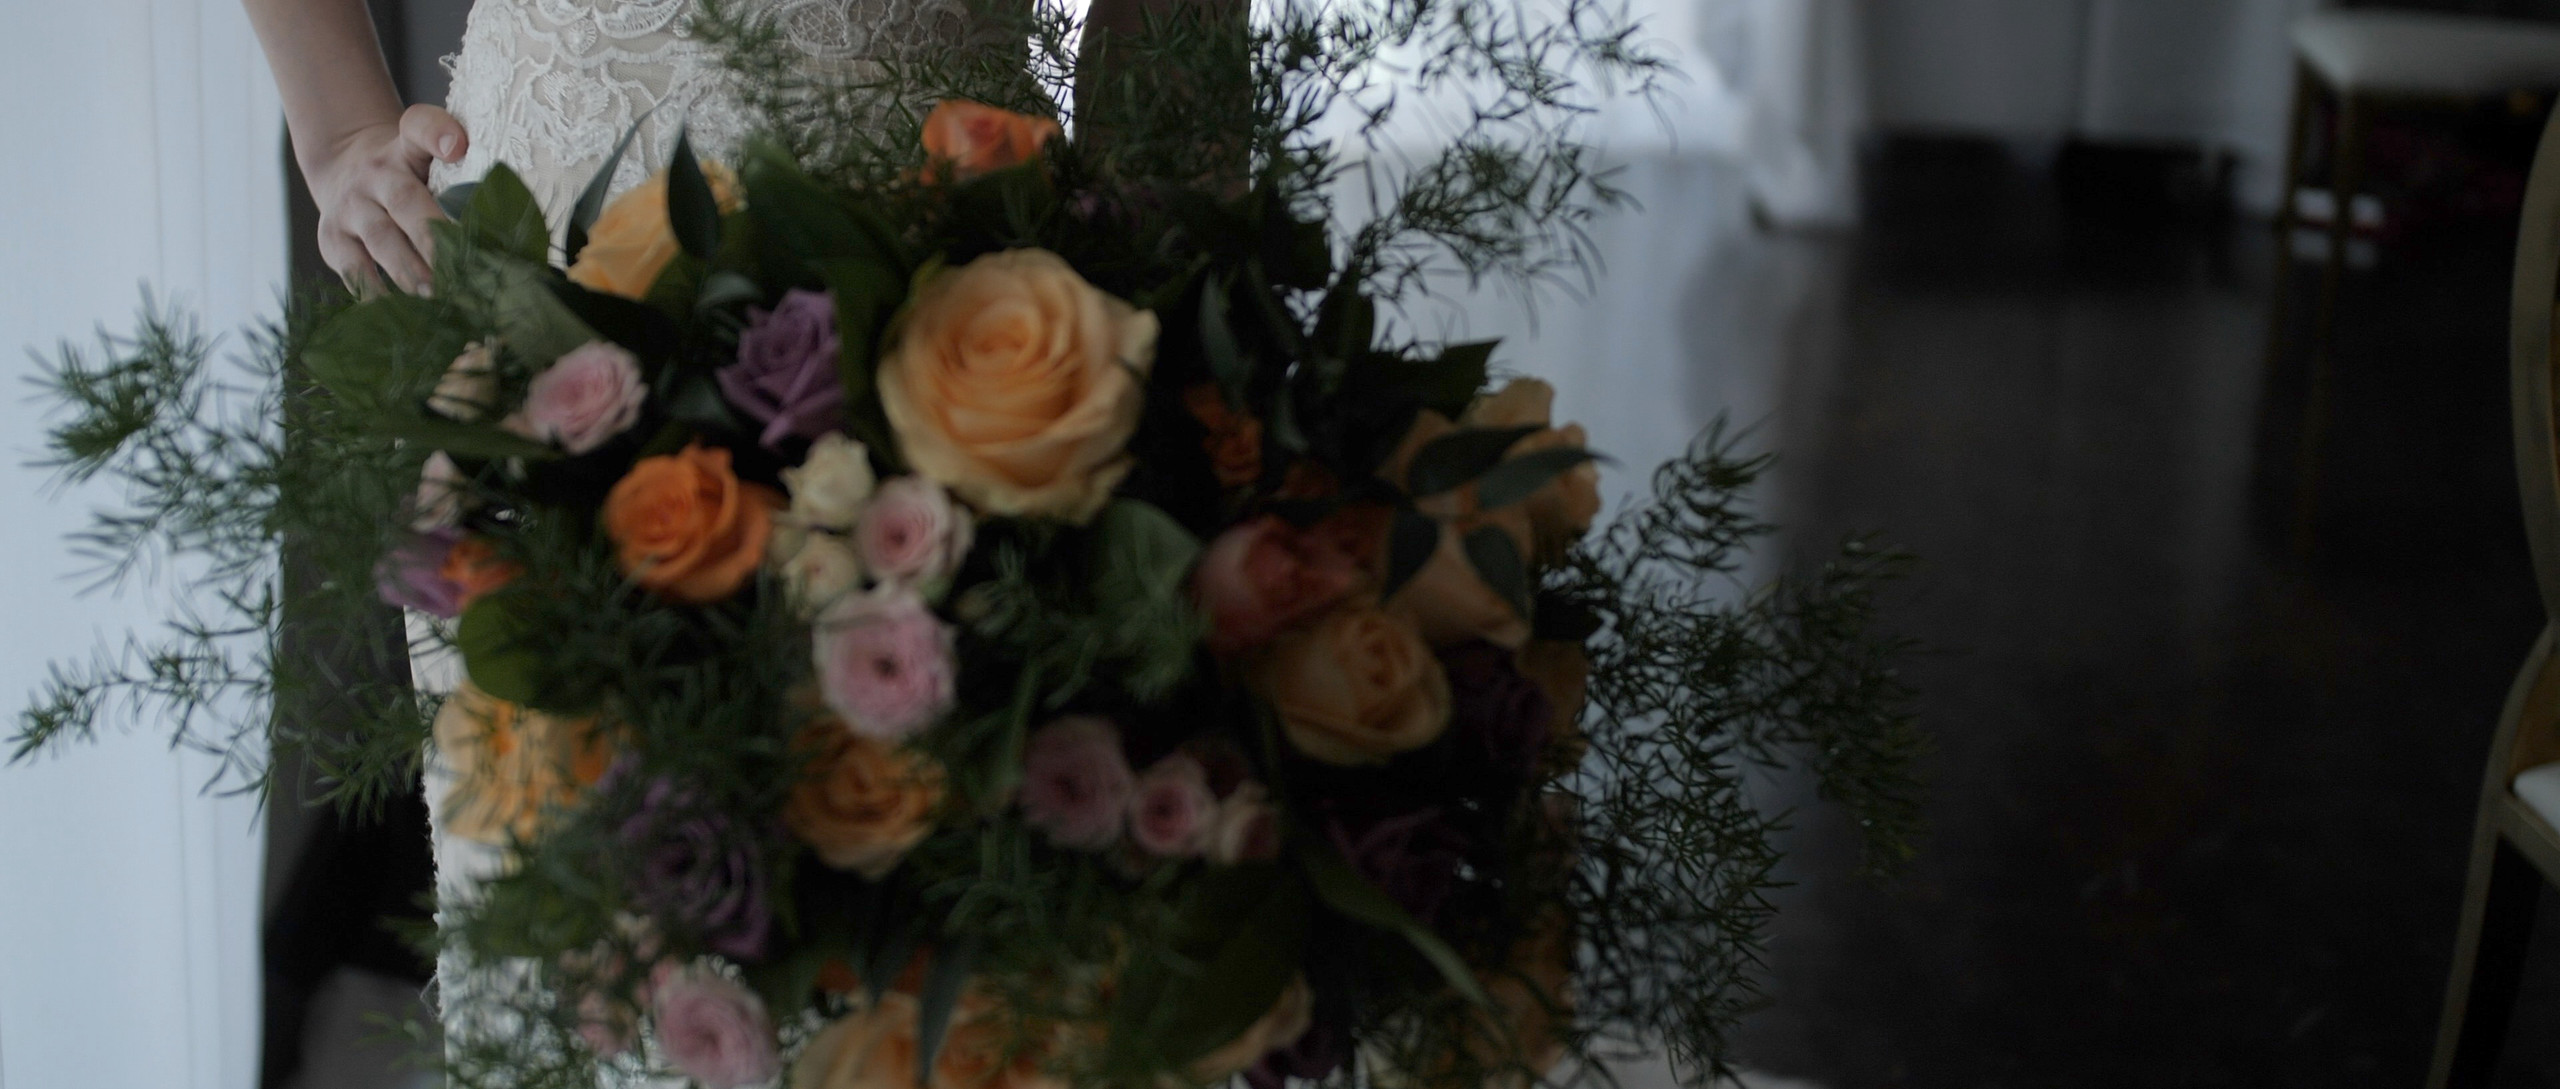 flowers close up london wedding films videographer